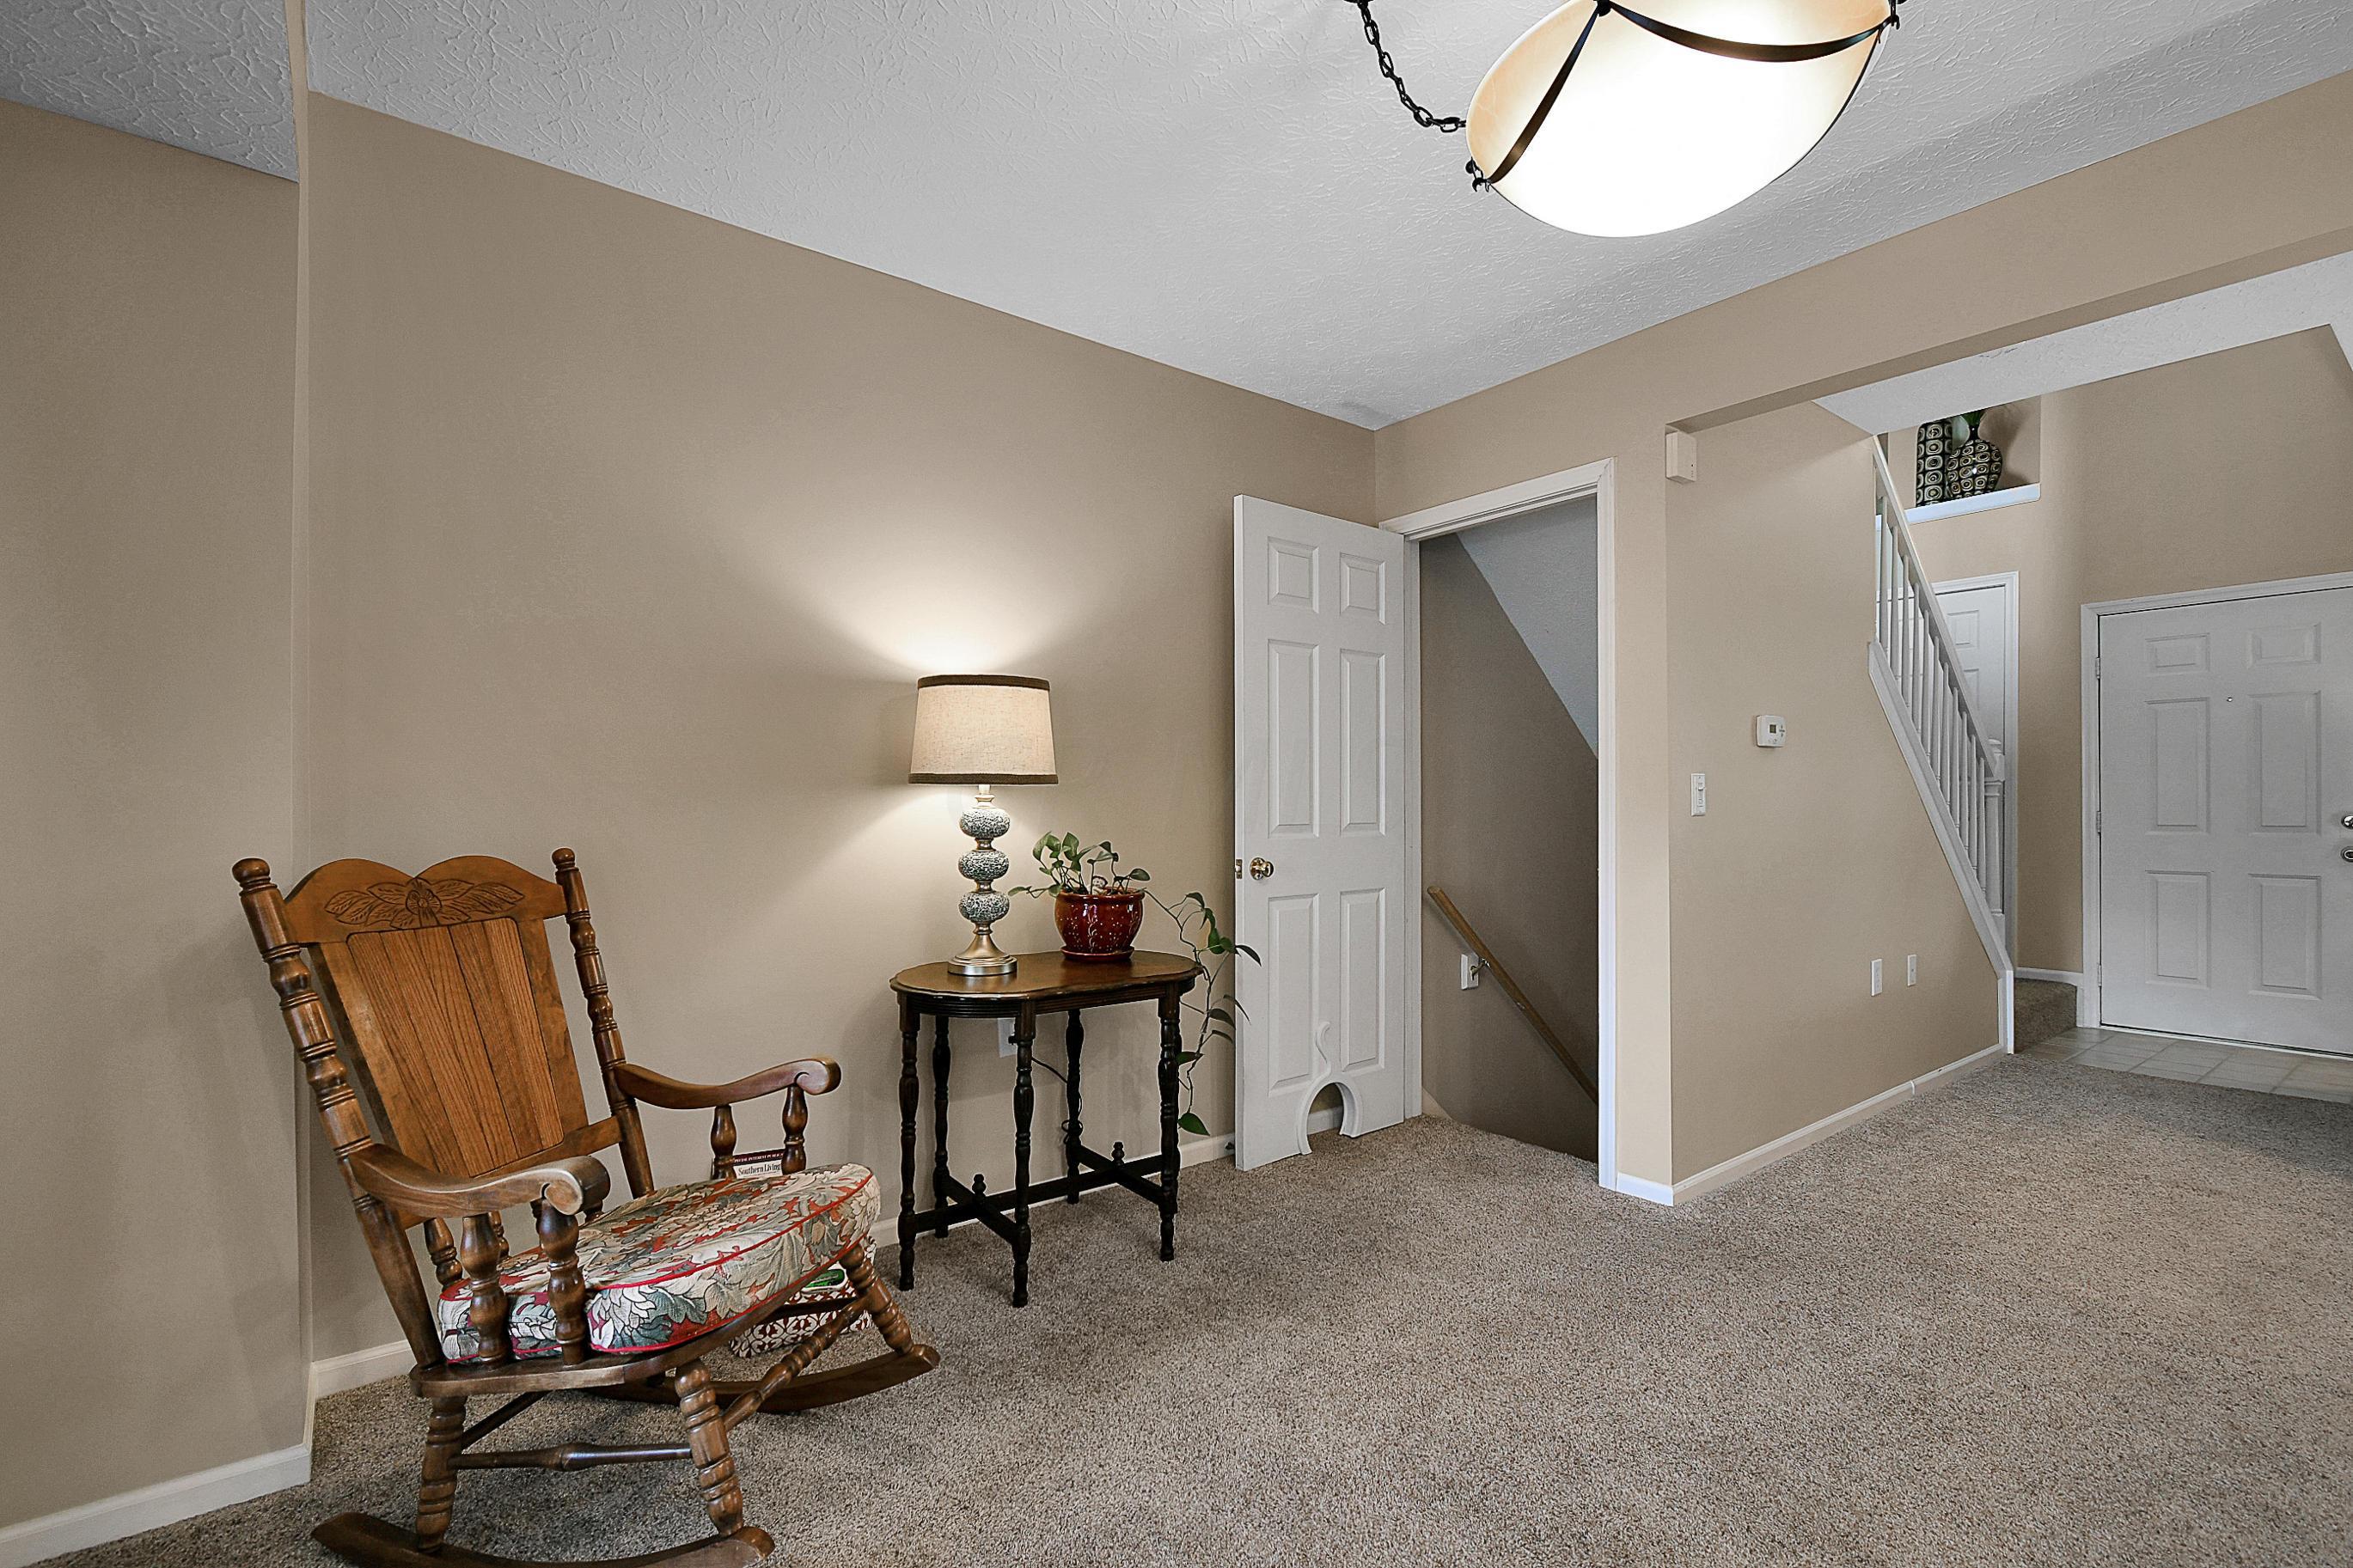 3055 Glenloch Circle, Dublin, Ohio 43017, 2 Bedrooms Bedrooms, ,3 BathroomsBathrooms,Residential,For Sale,Glenloch,220024854